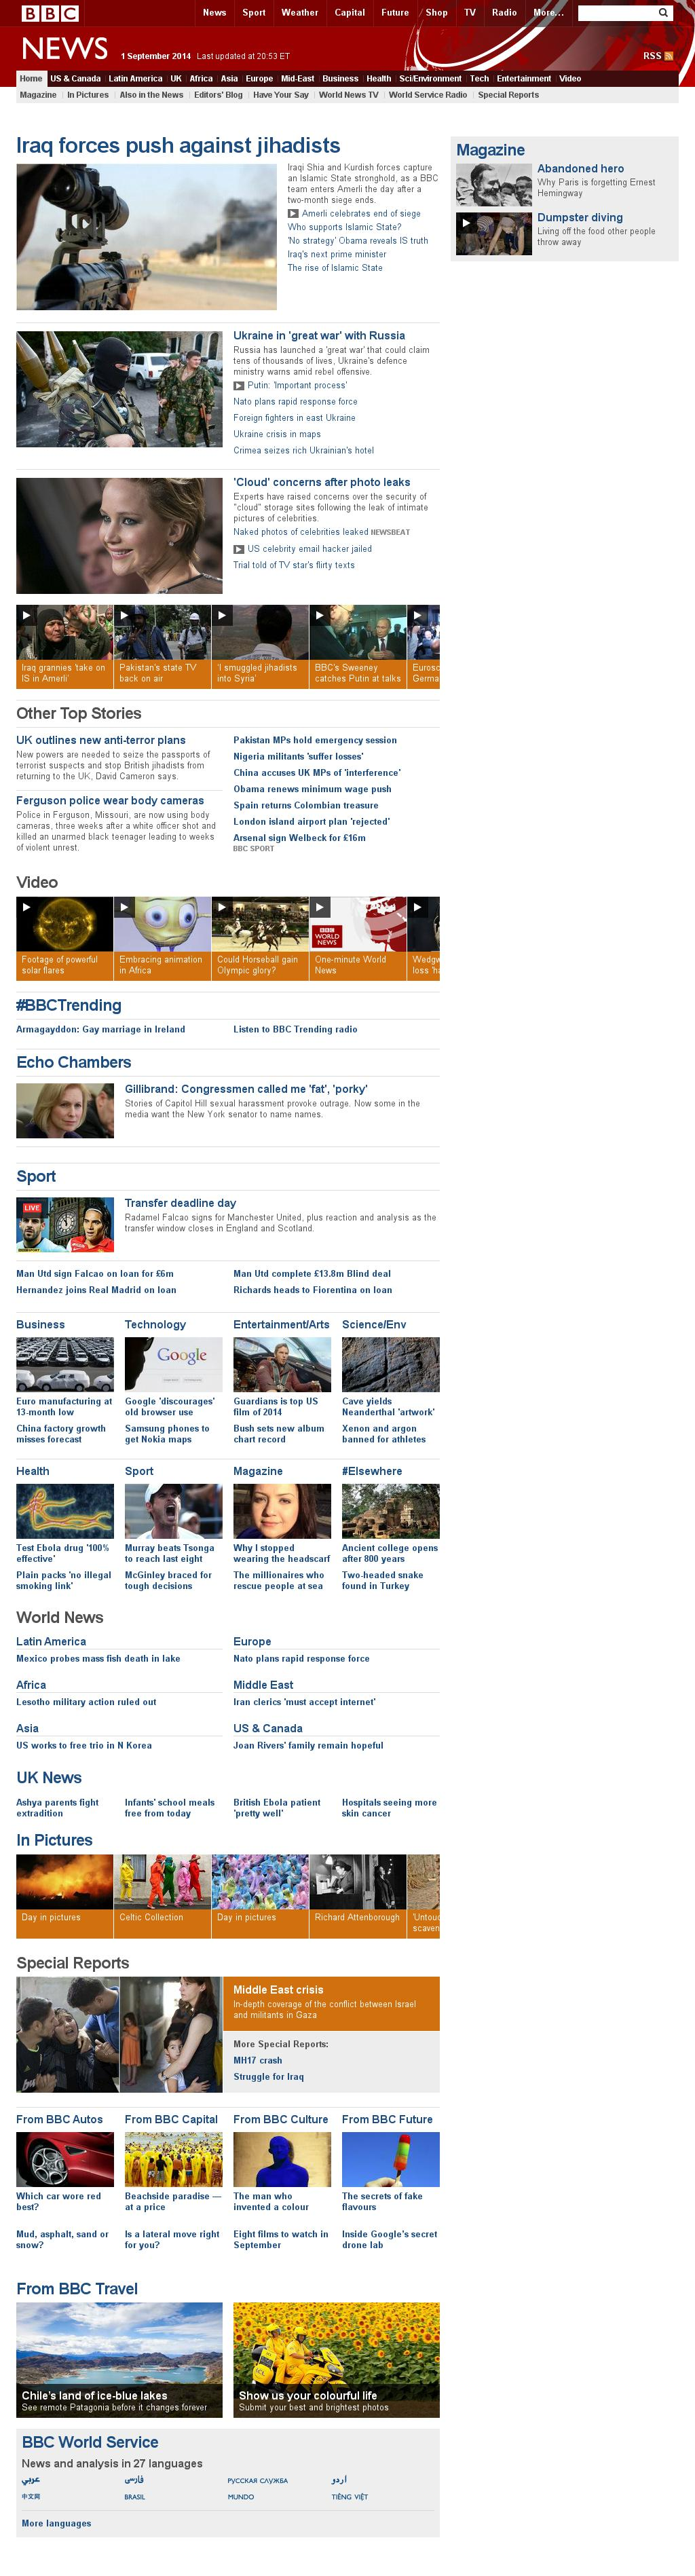 BBC at Tuesday Sept. 2, 2014, 1 a.m. UTC